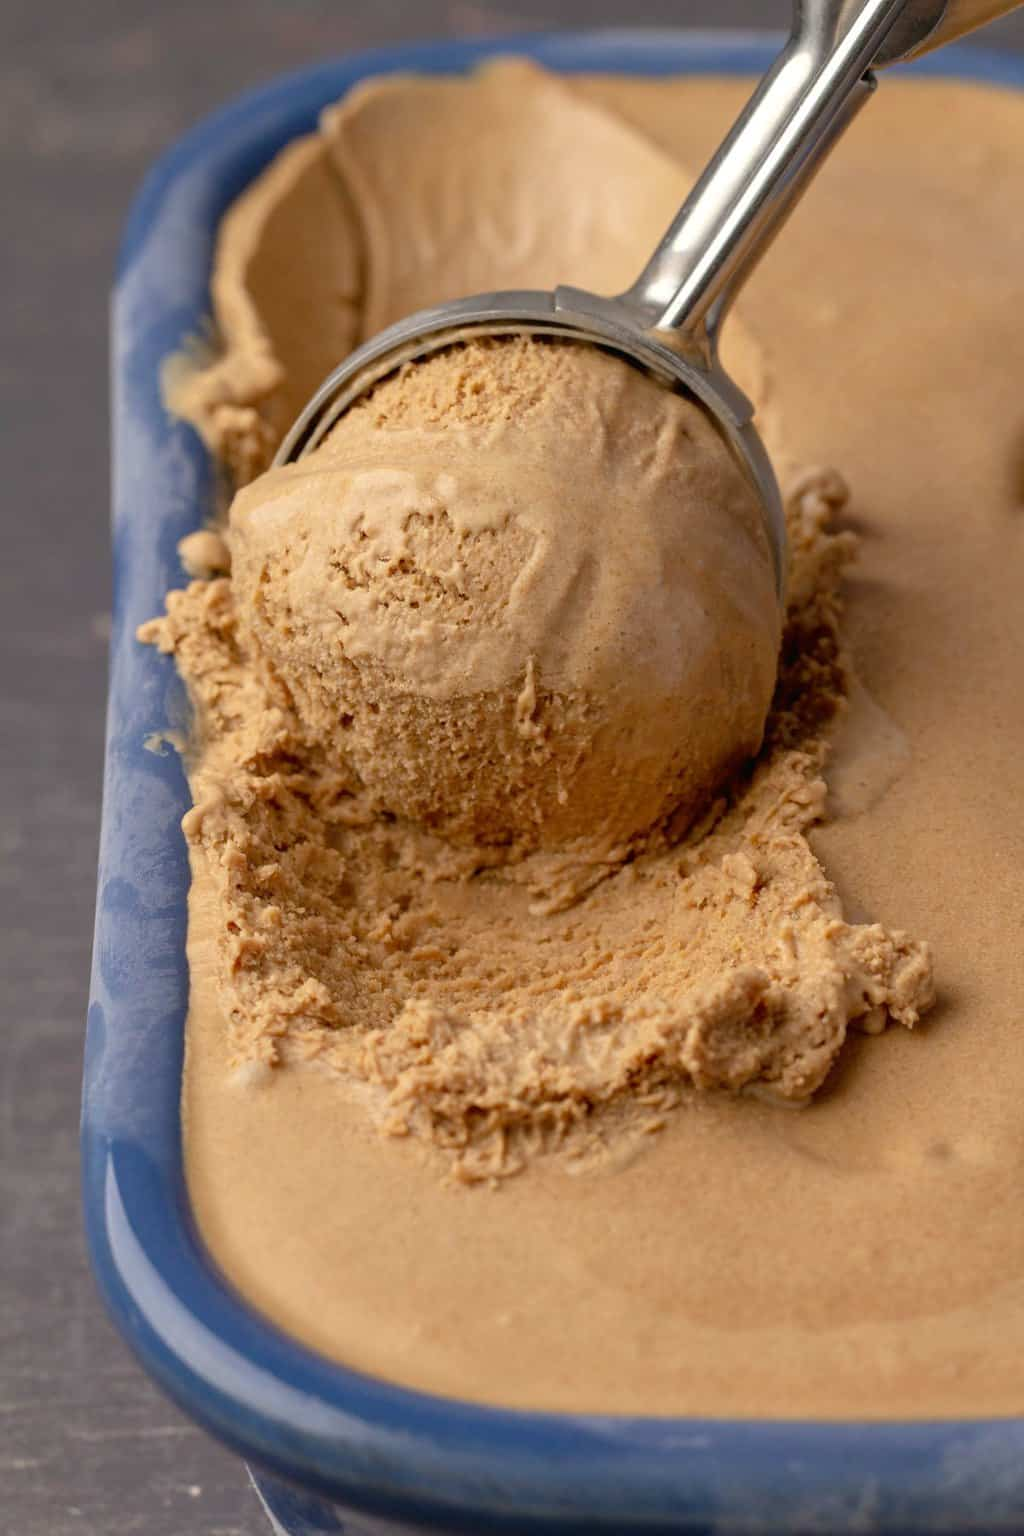 Vegan coffee ice cream in a blue ceramic dish with an ice cream scoop.